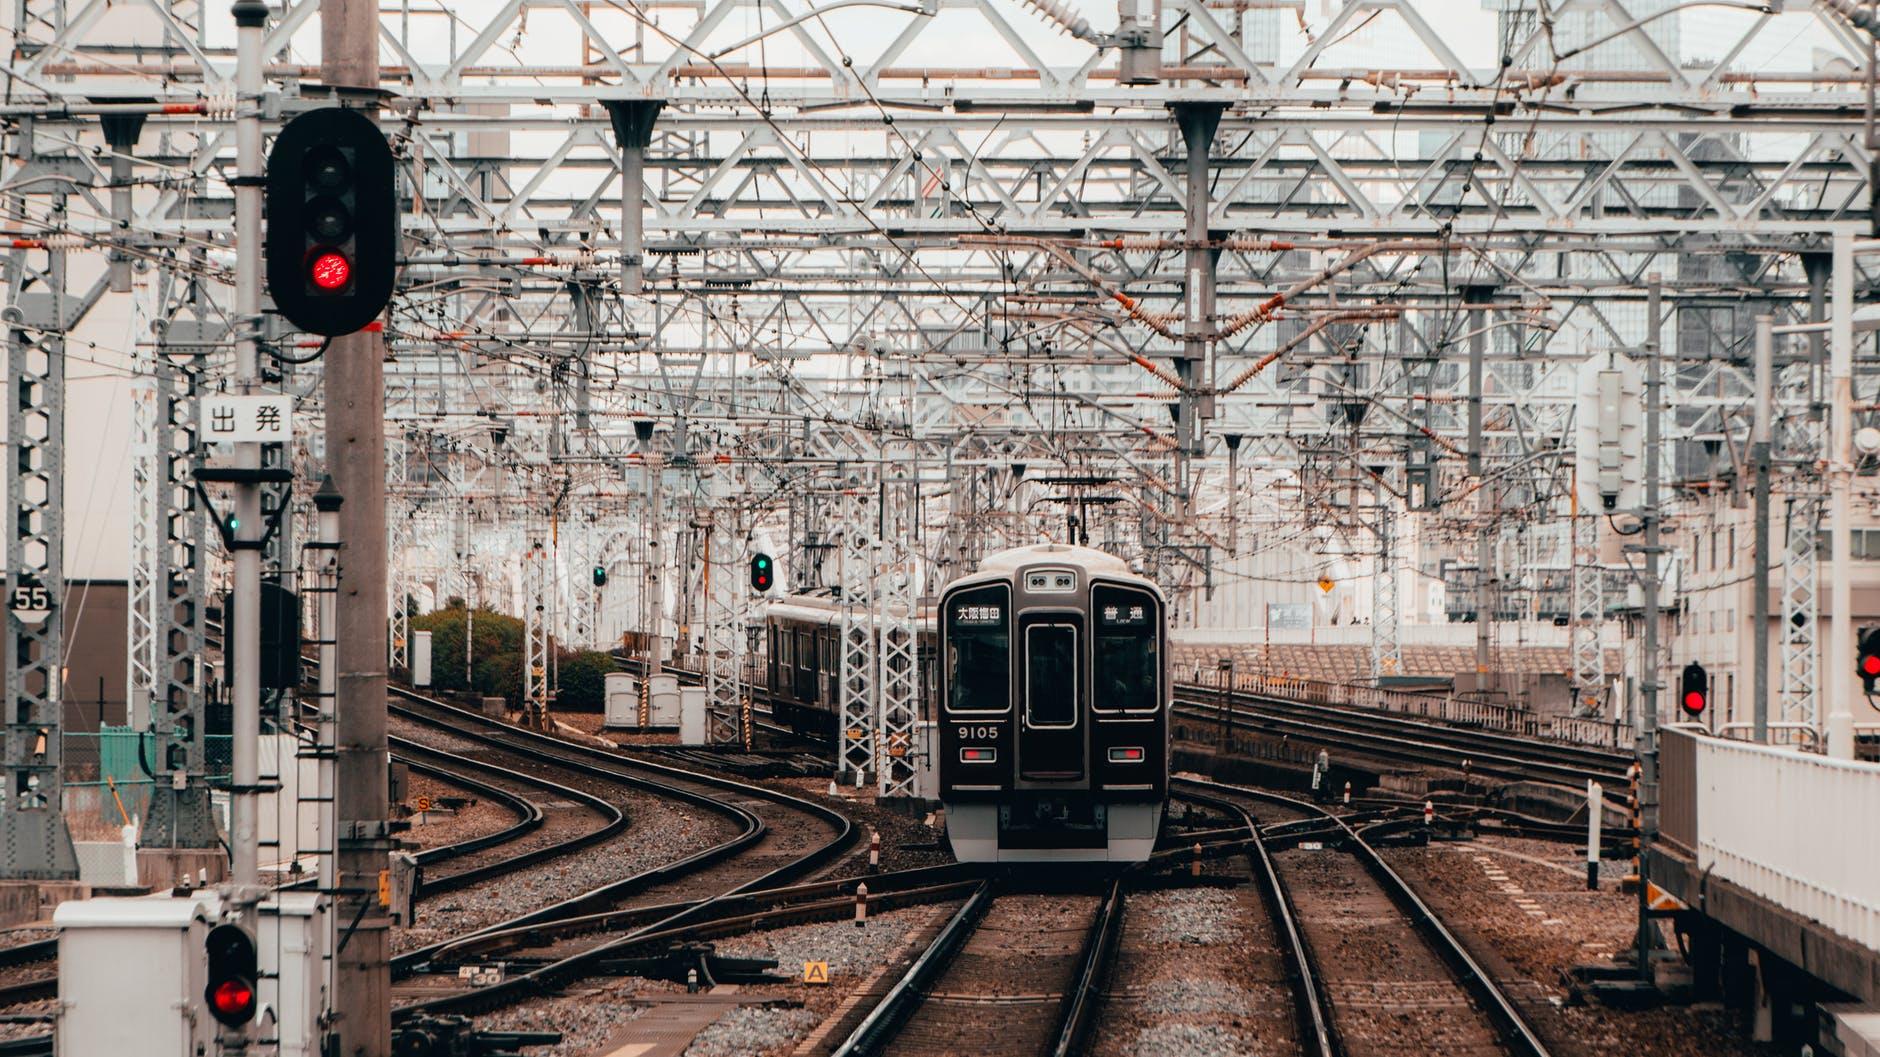 black and gray train on rail tracks